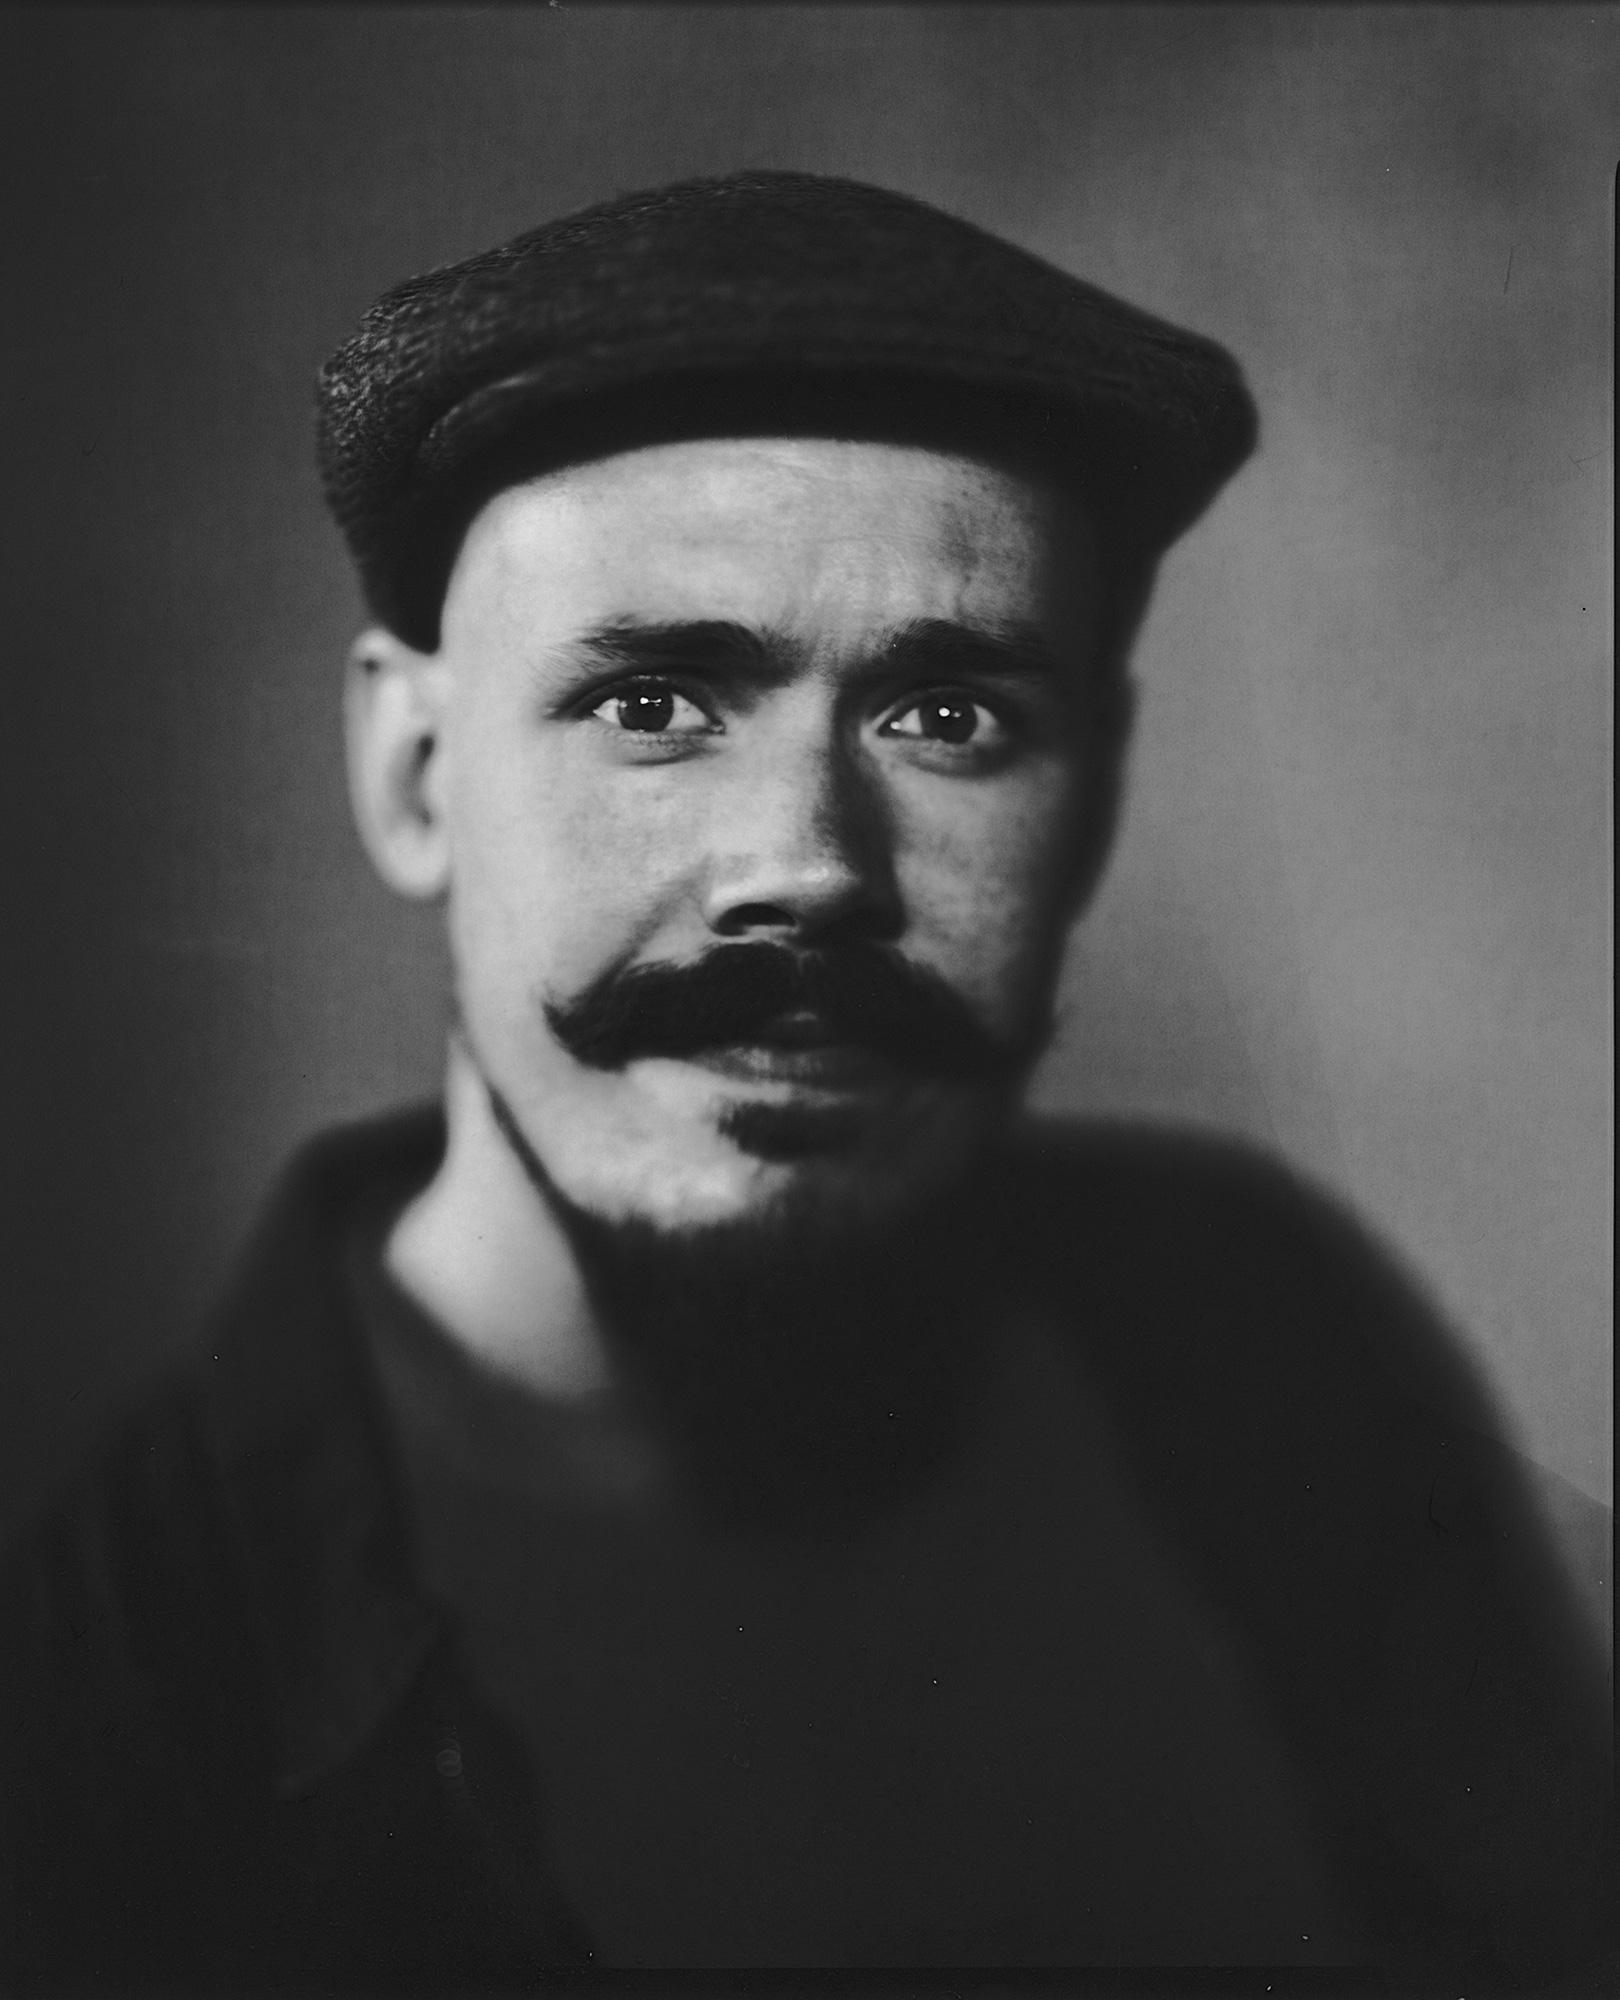 Fotograf i Oslo tar et portrett av en ung mann med hatt